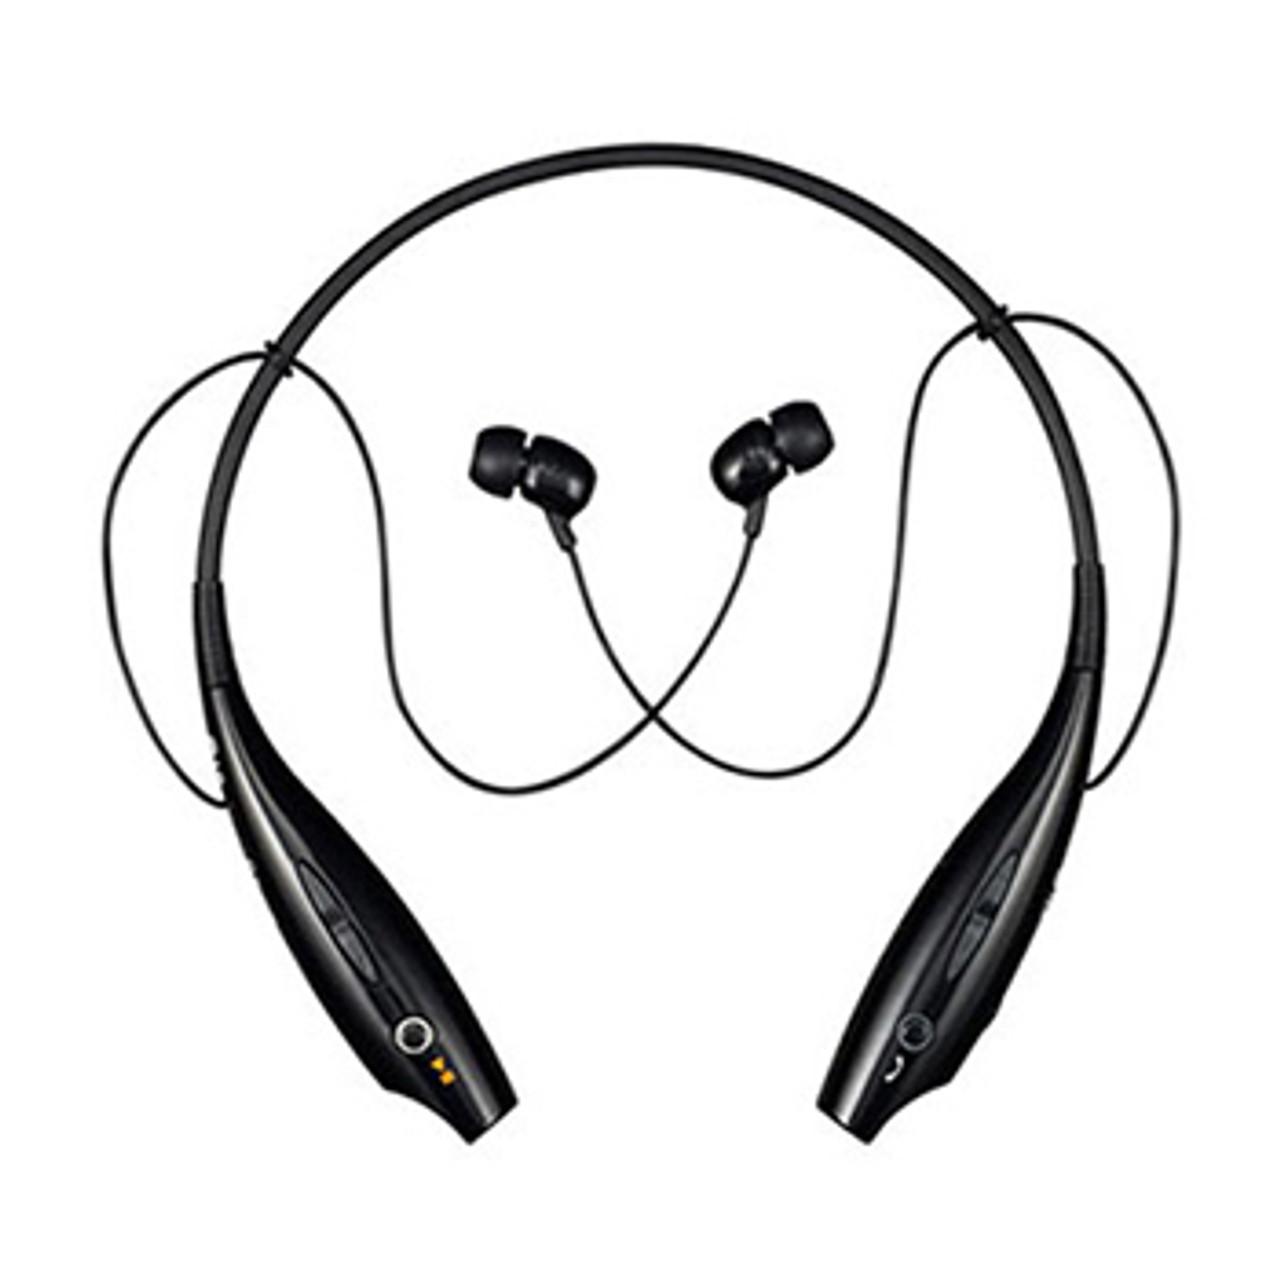 LG HBS-700 Bluetooth Stereo Headset - Esurebuy 0c77f79001